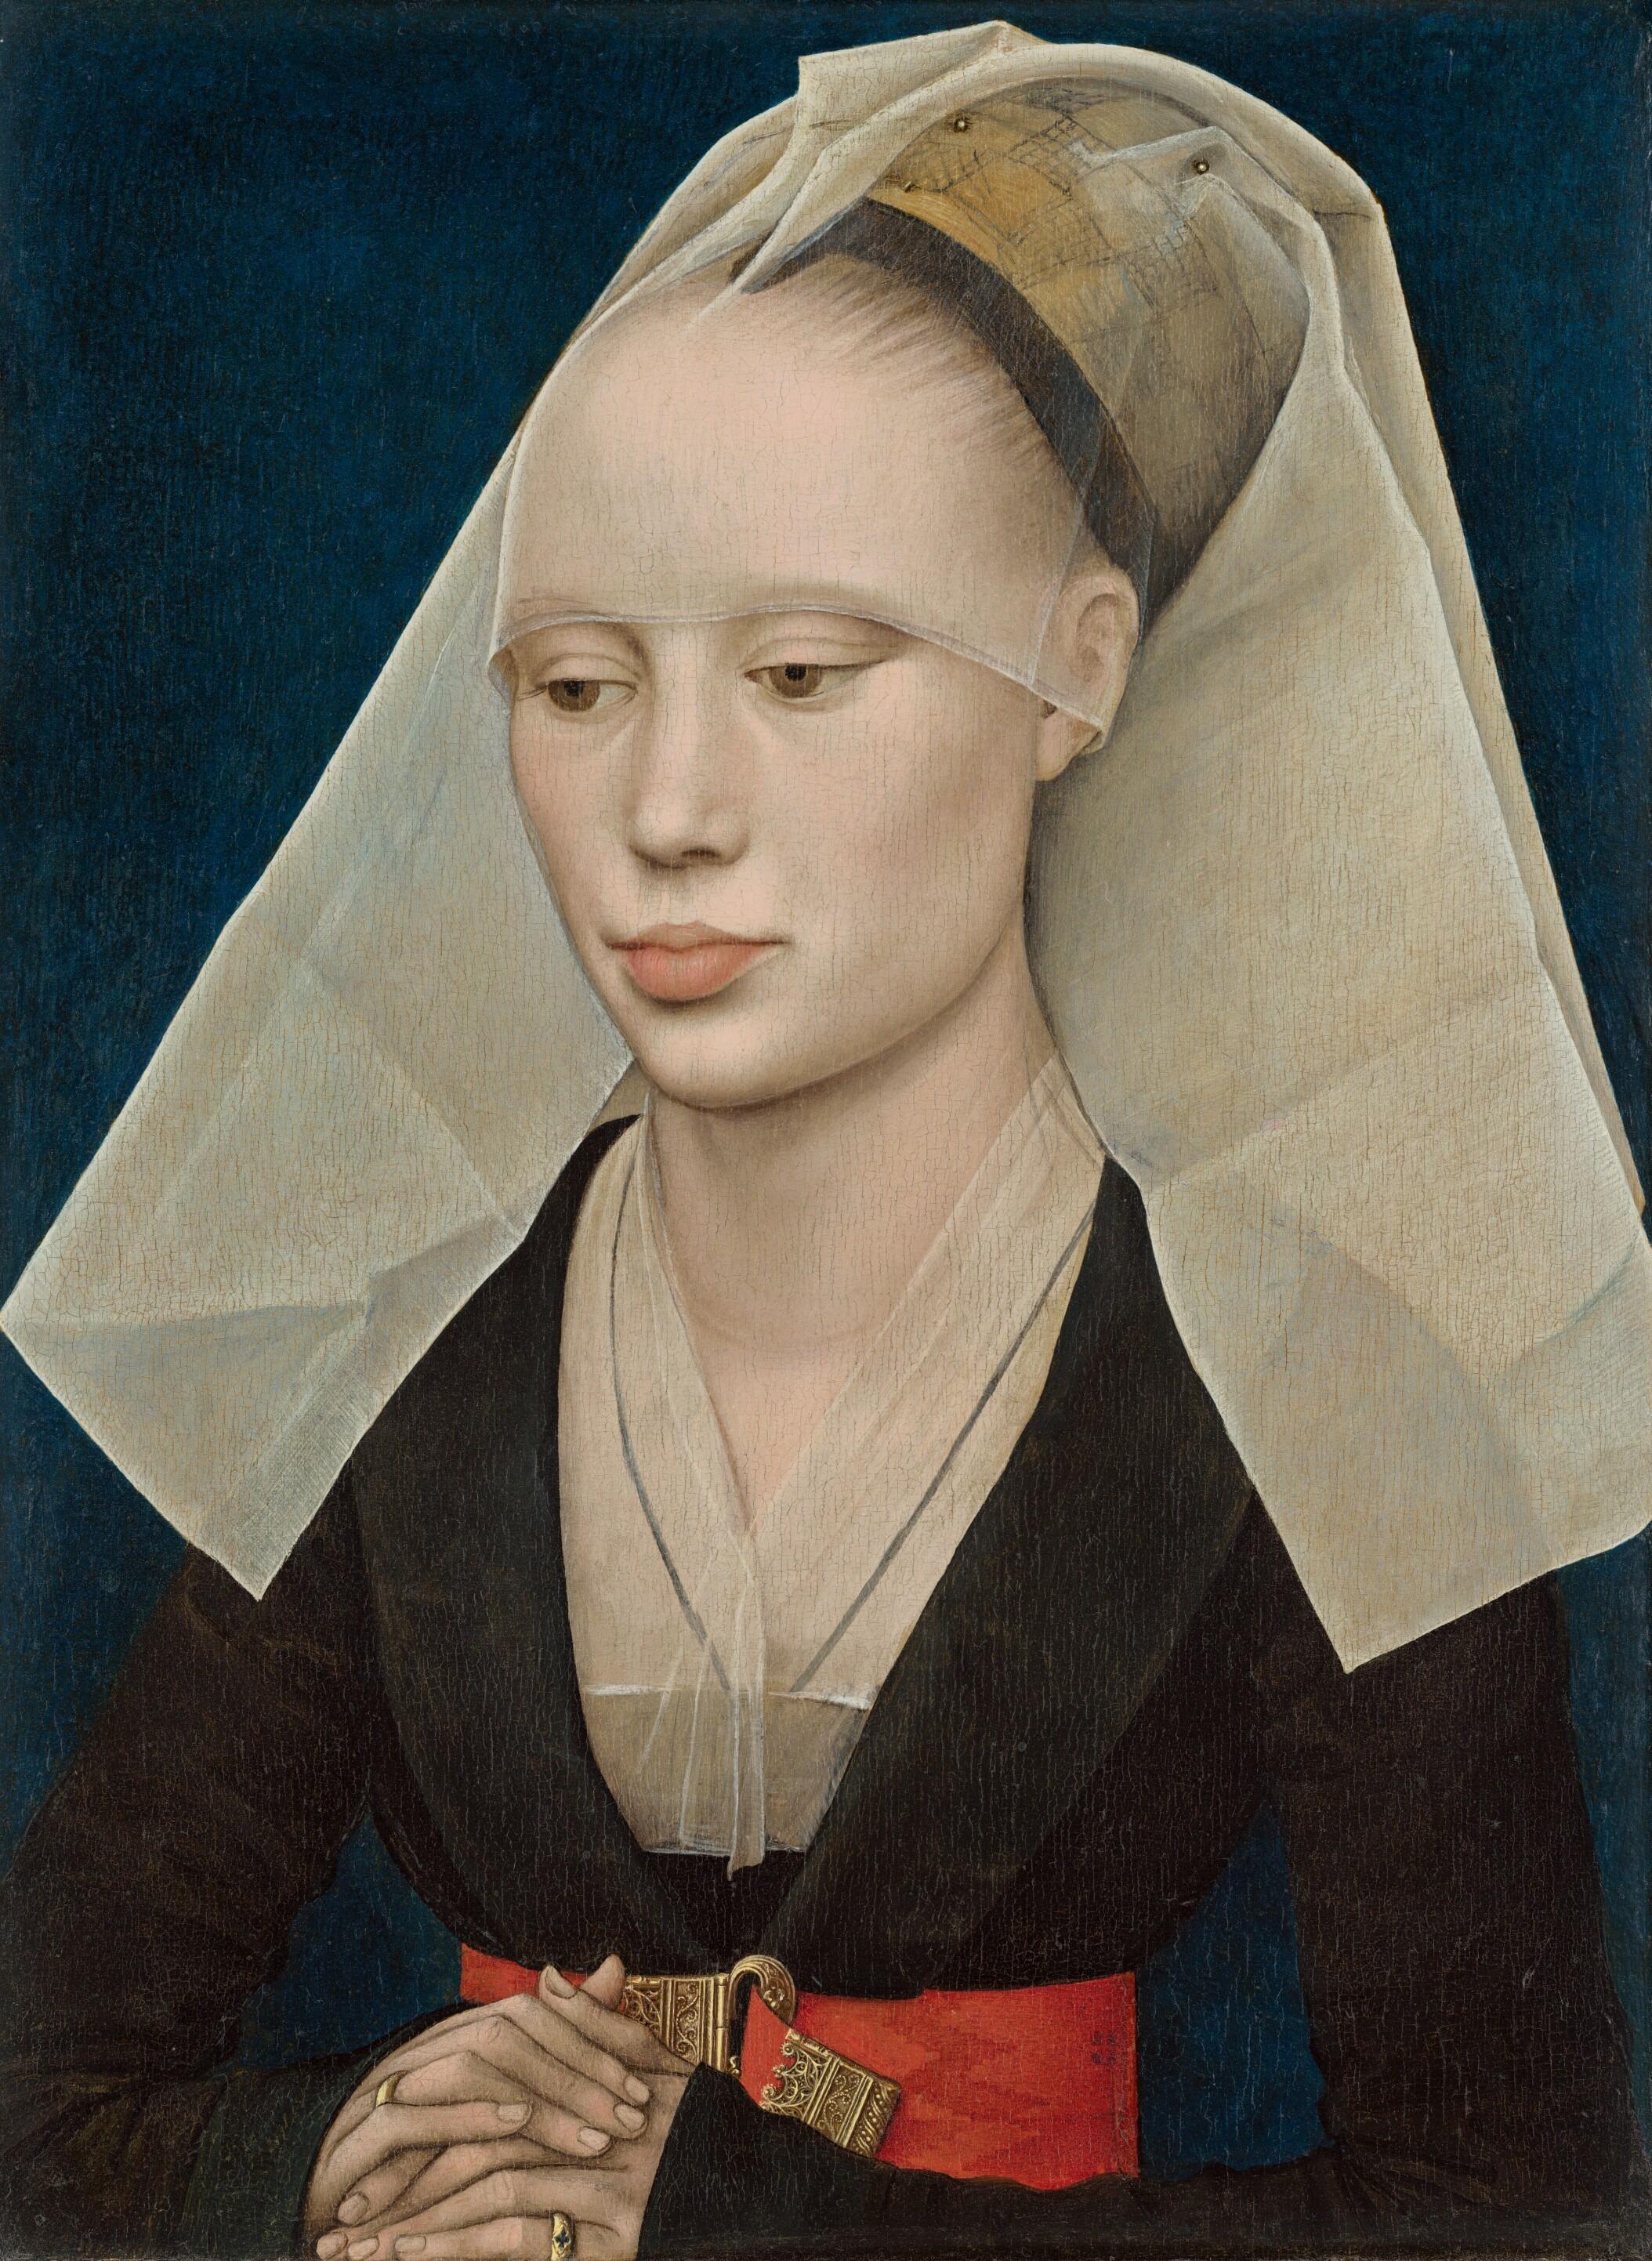 English: Rogier van der Weyden. Portrait of a ...